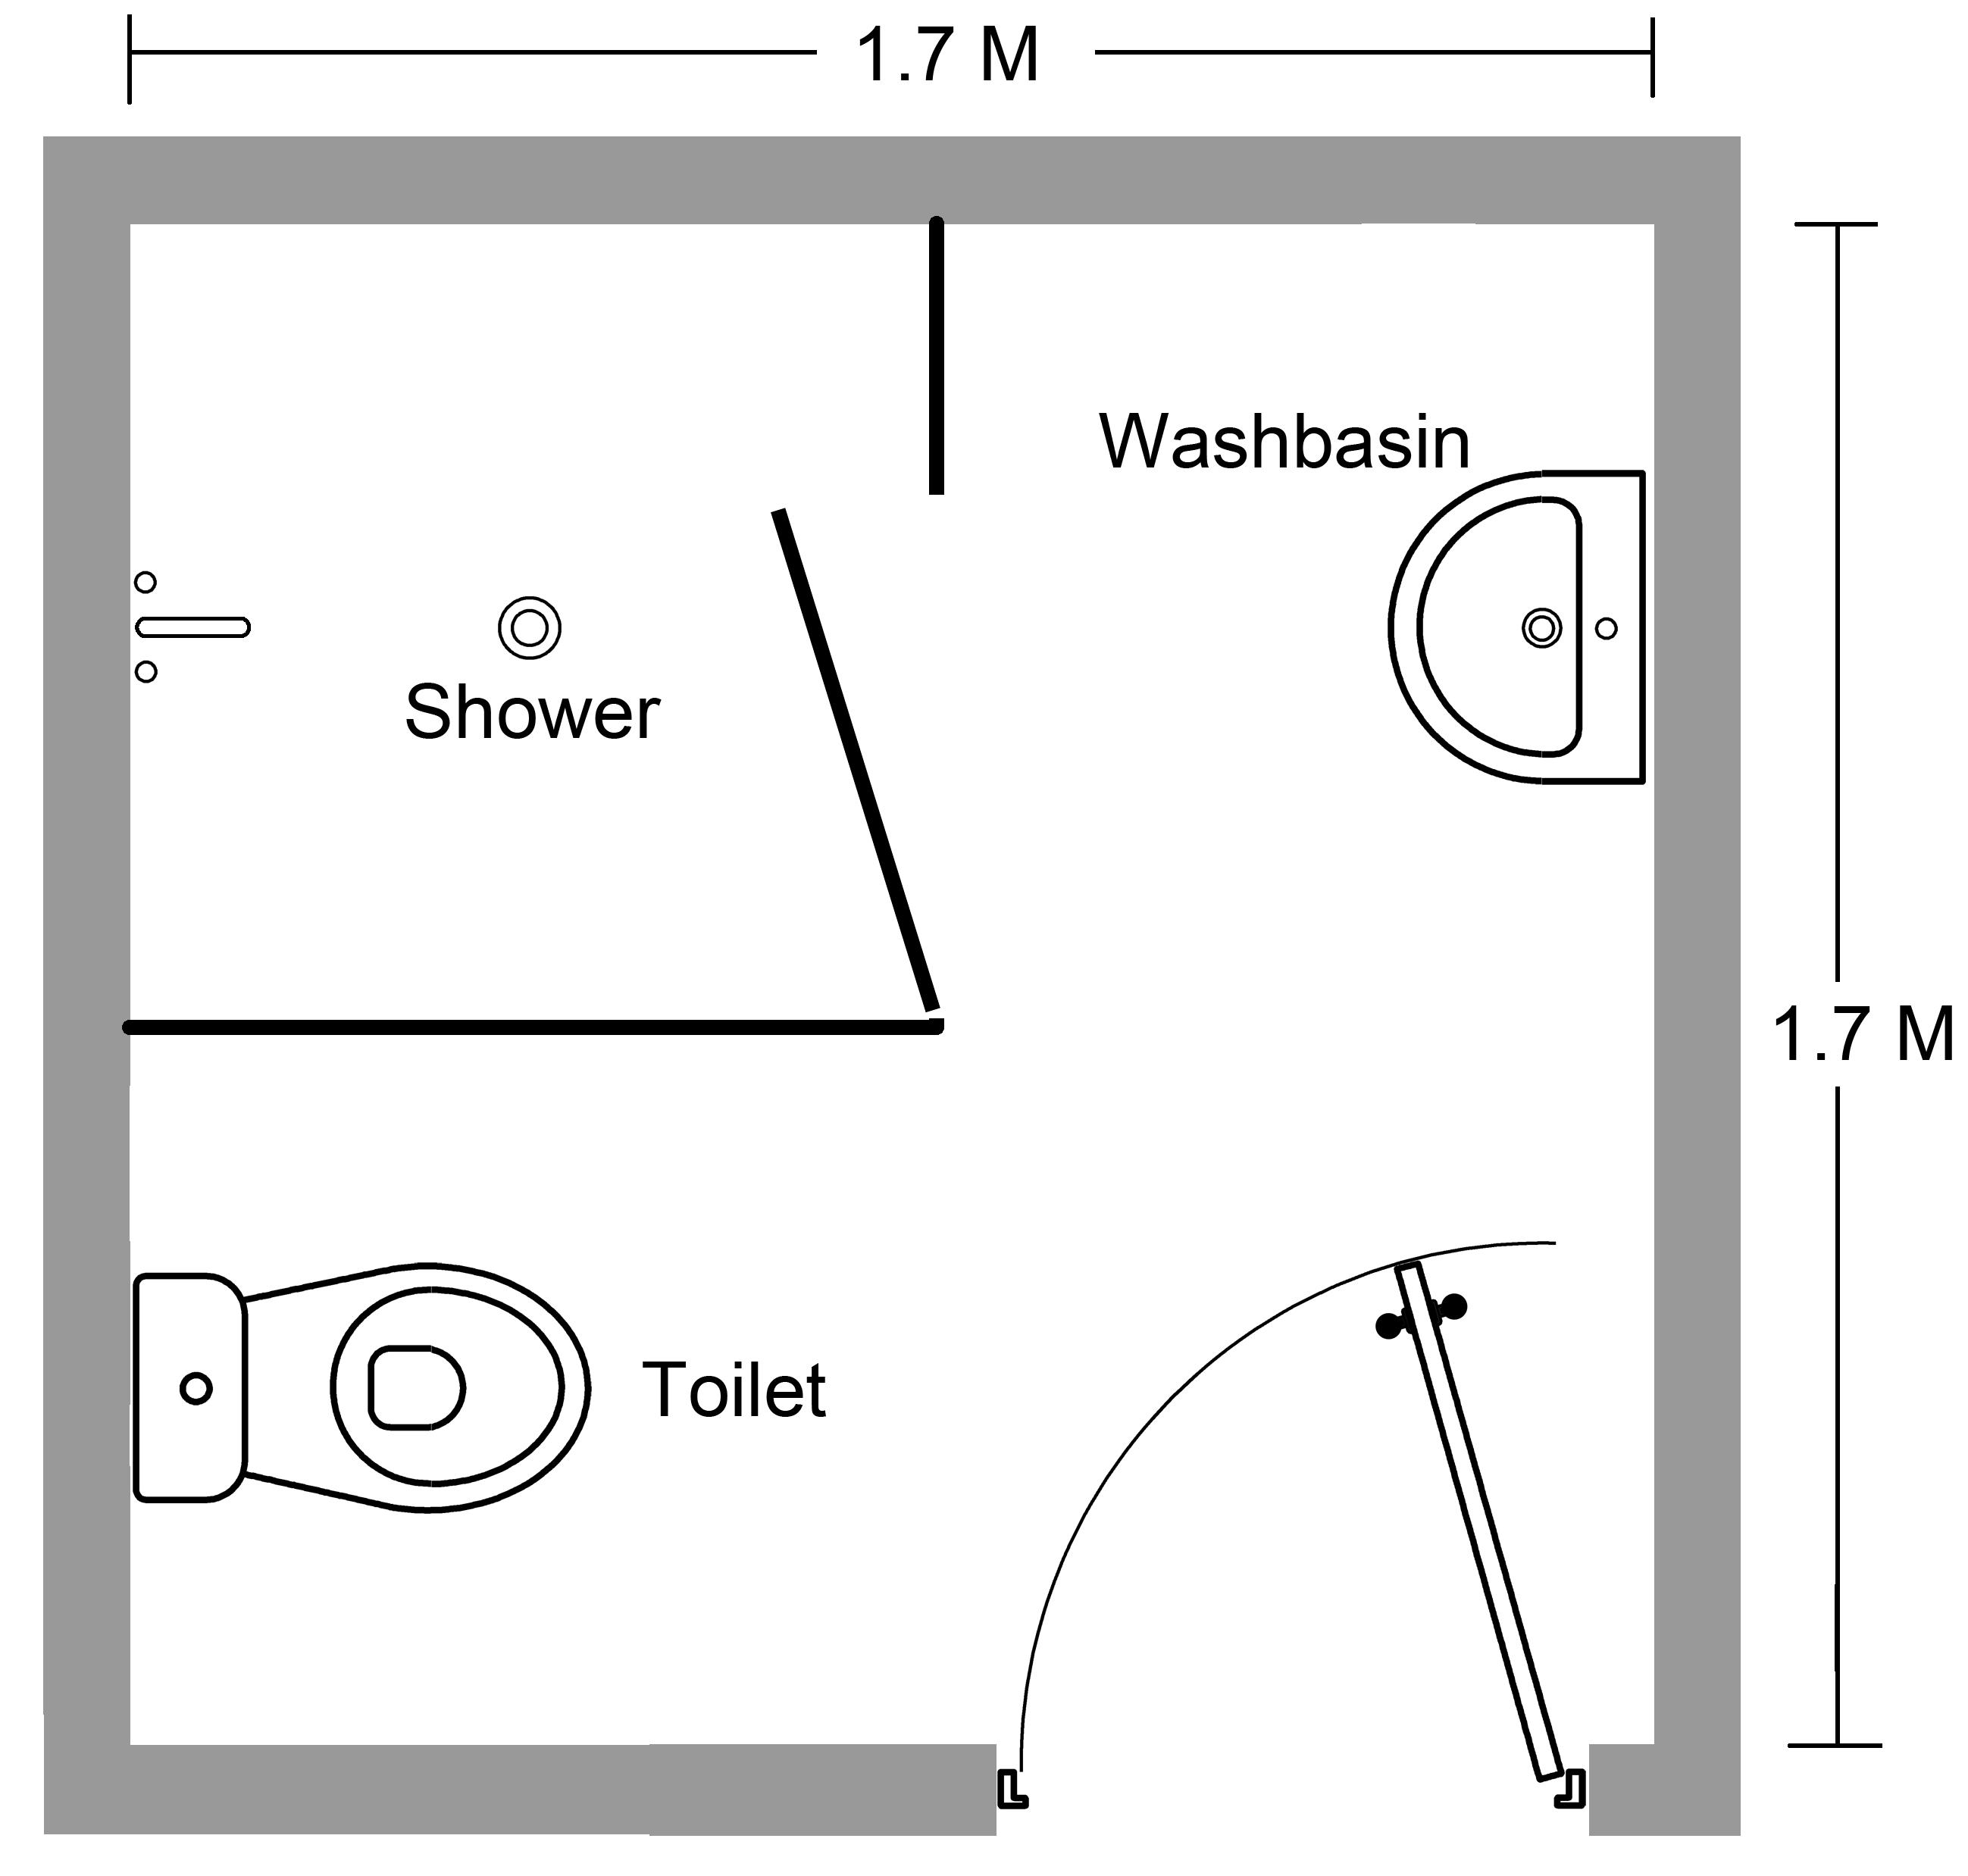 Efficient Bathroom And Toilet Layout Design 1. interior designer ...